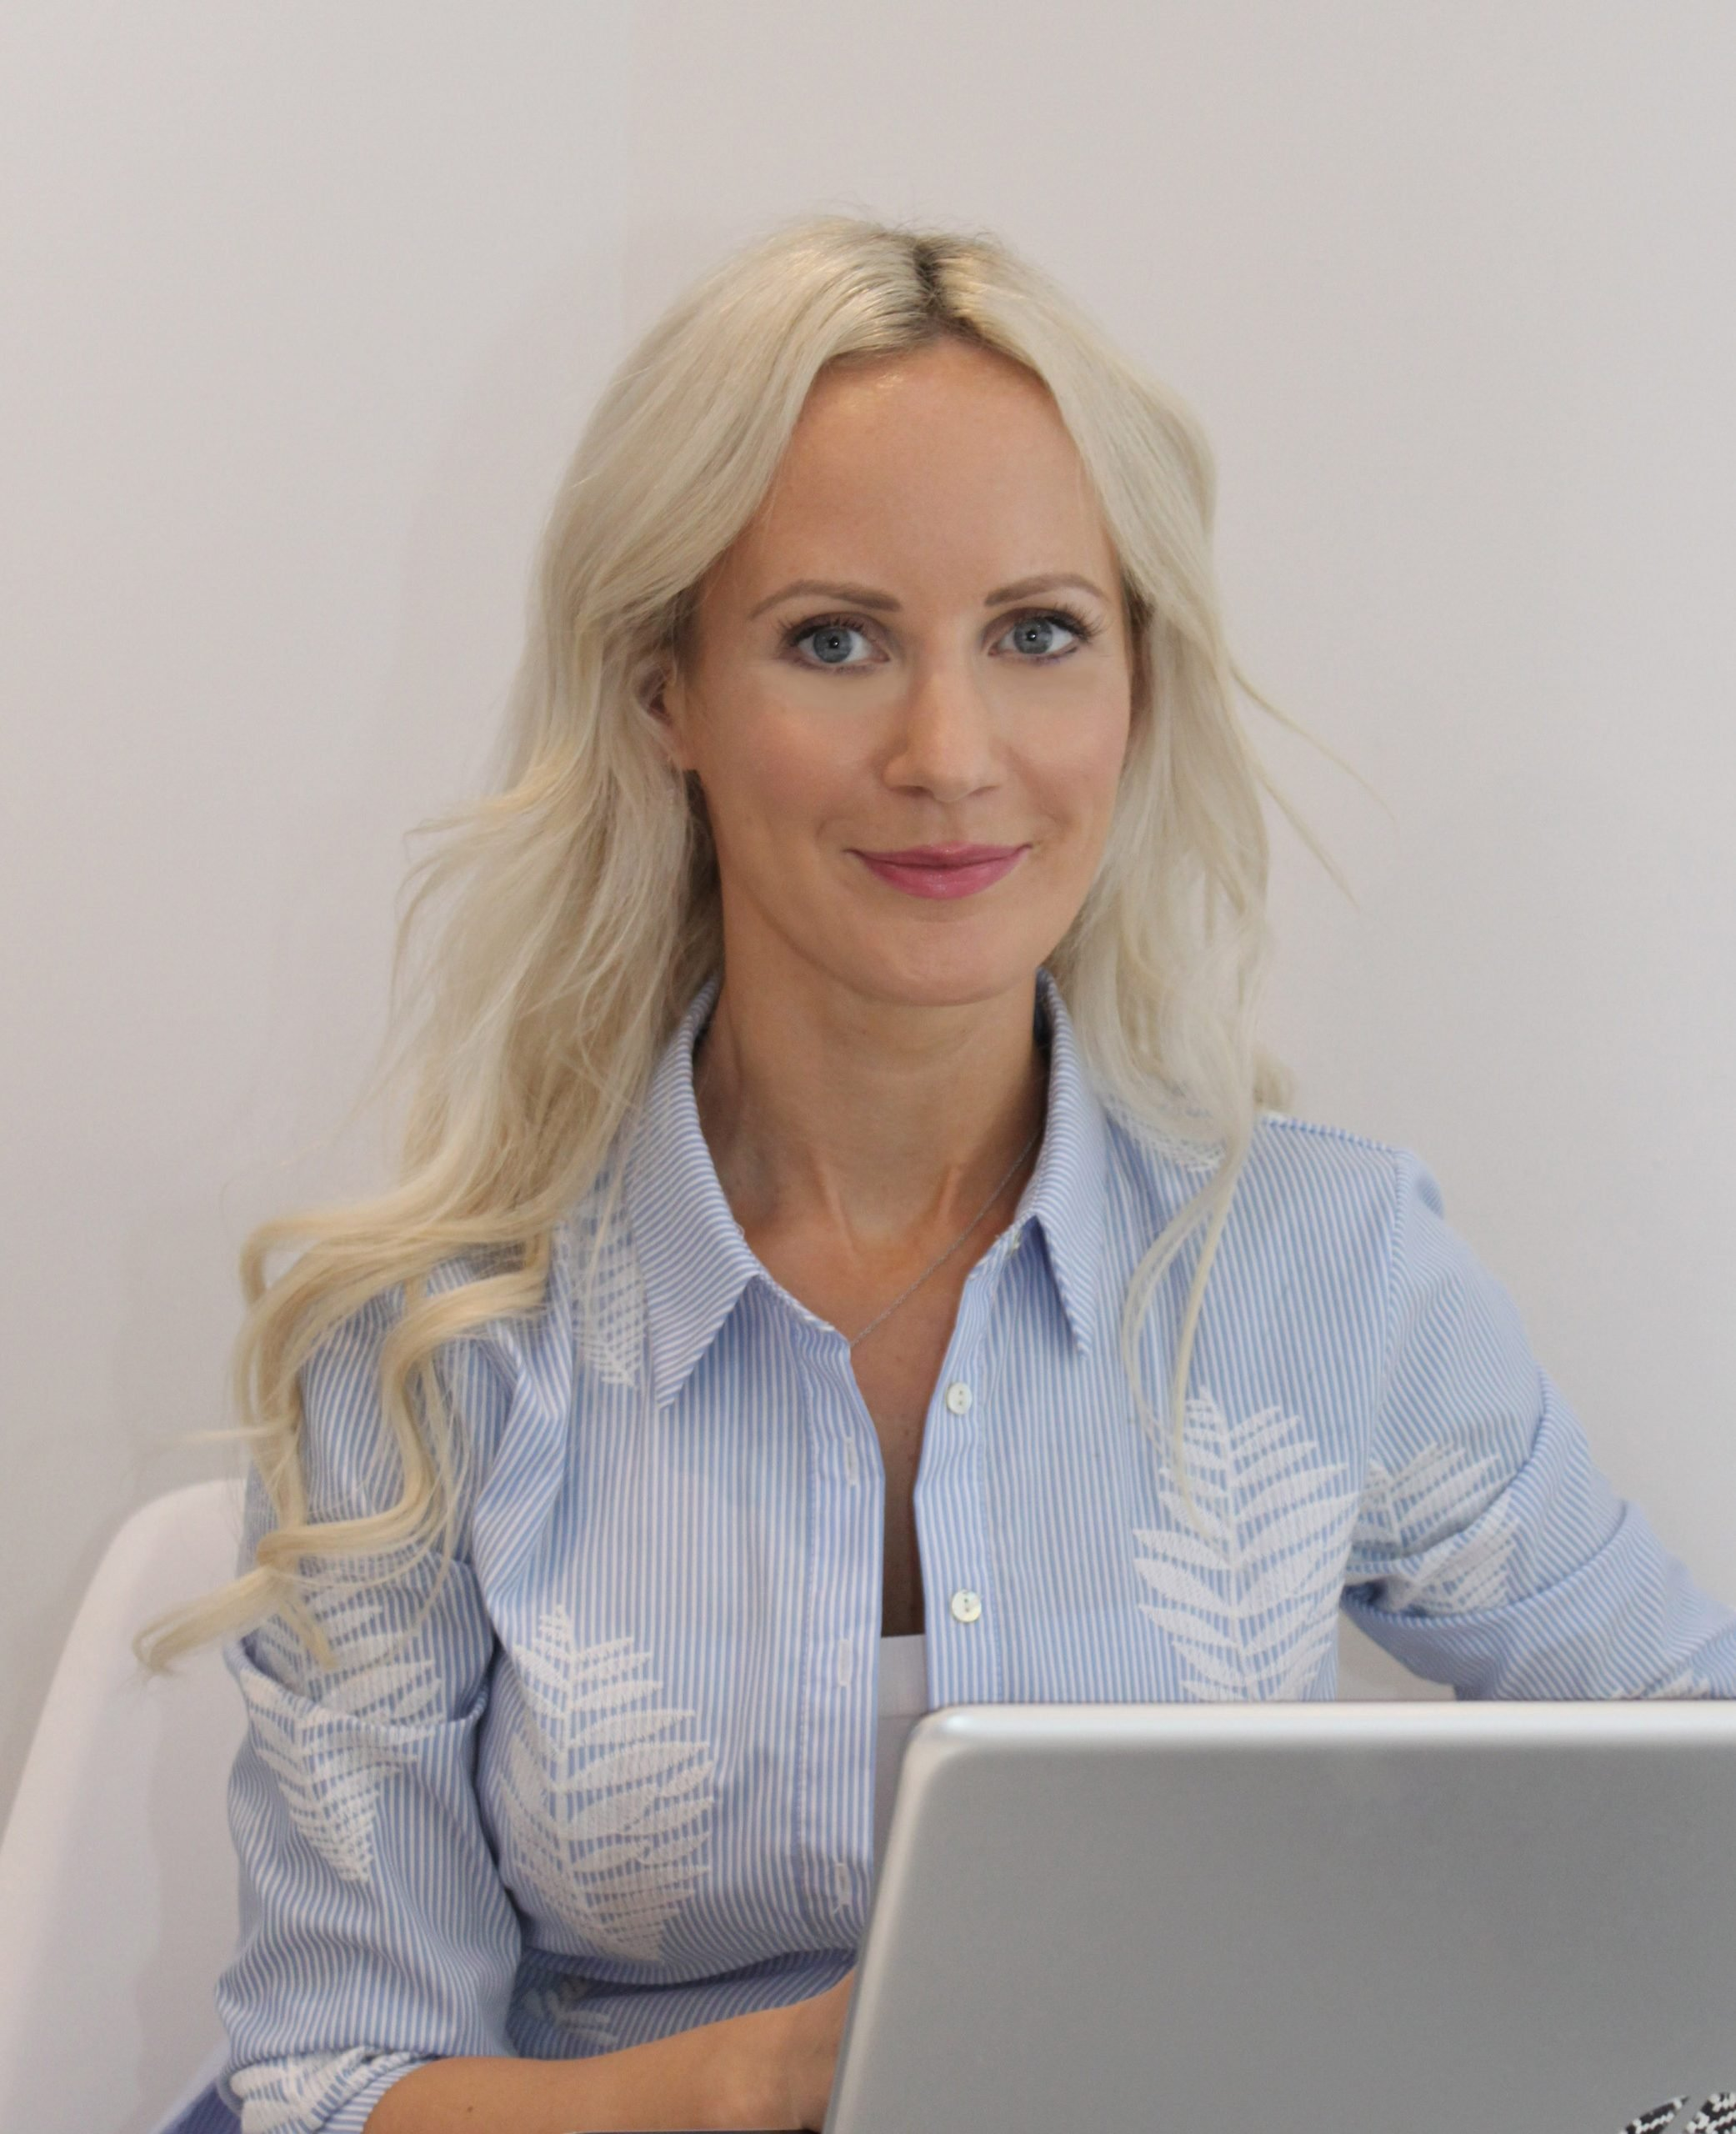 Sanna Atherton - Registered Nutritionist, MBA, mBANT, mCNHC